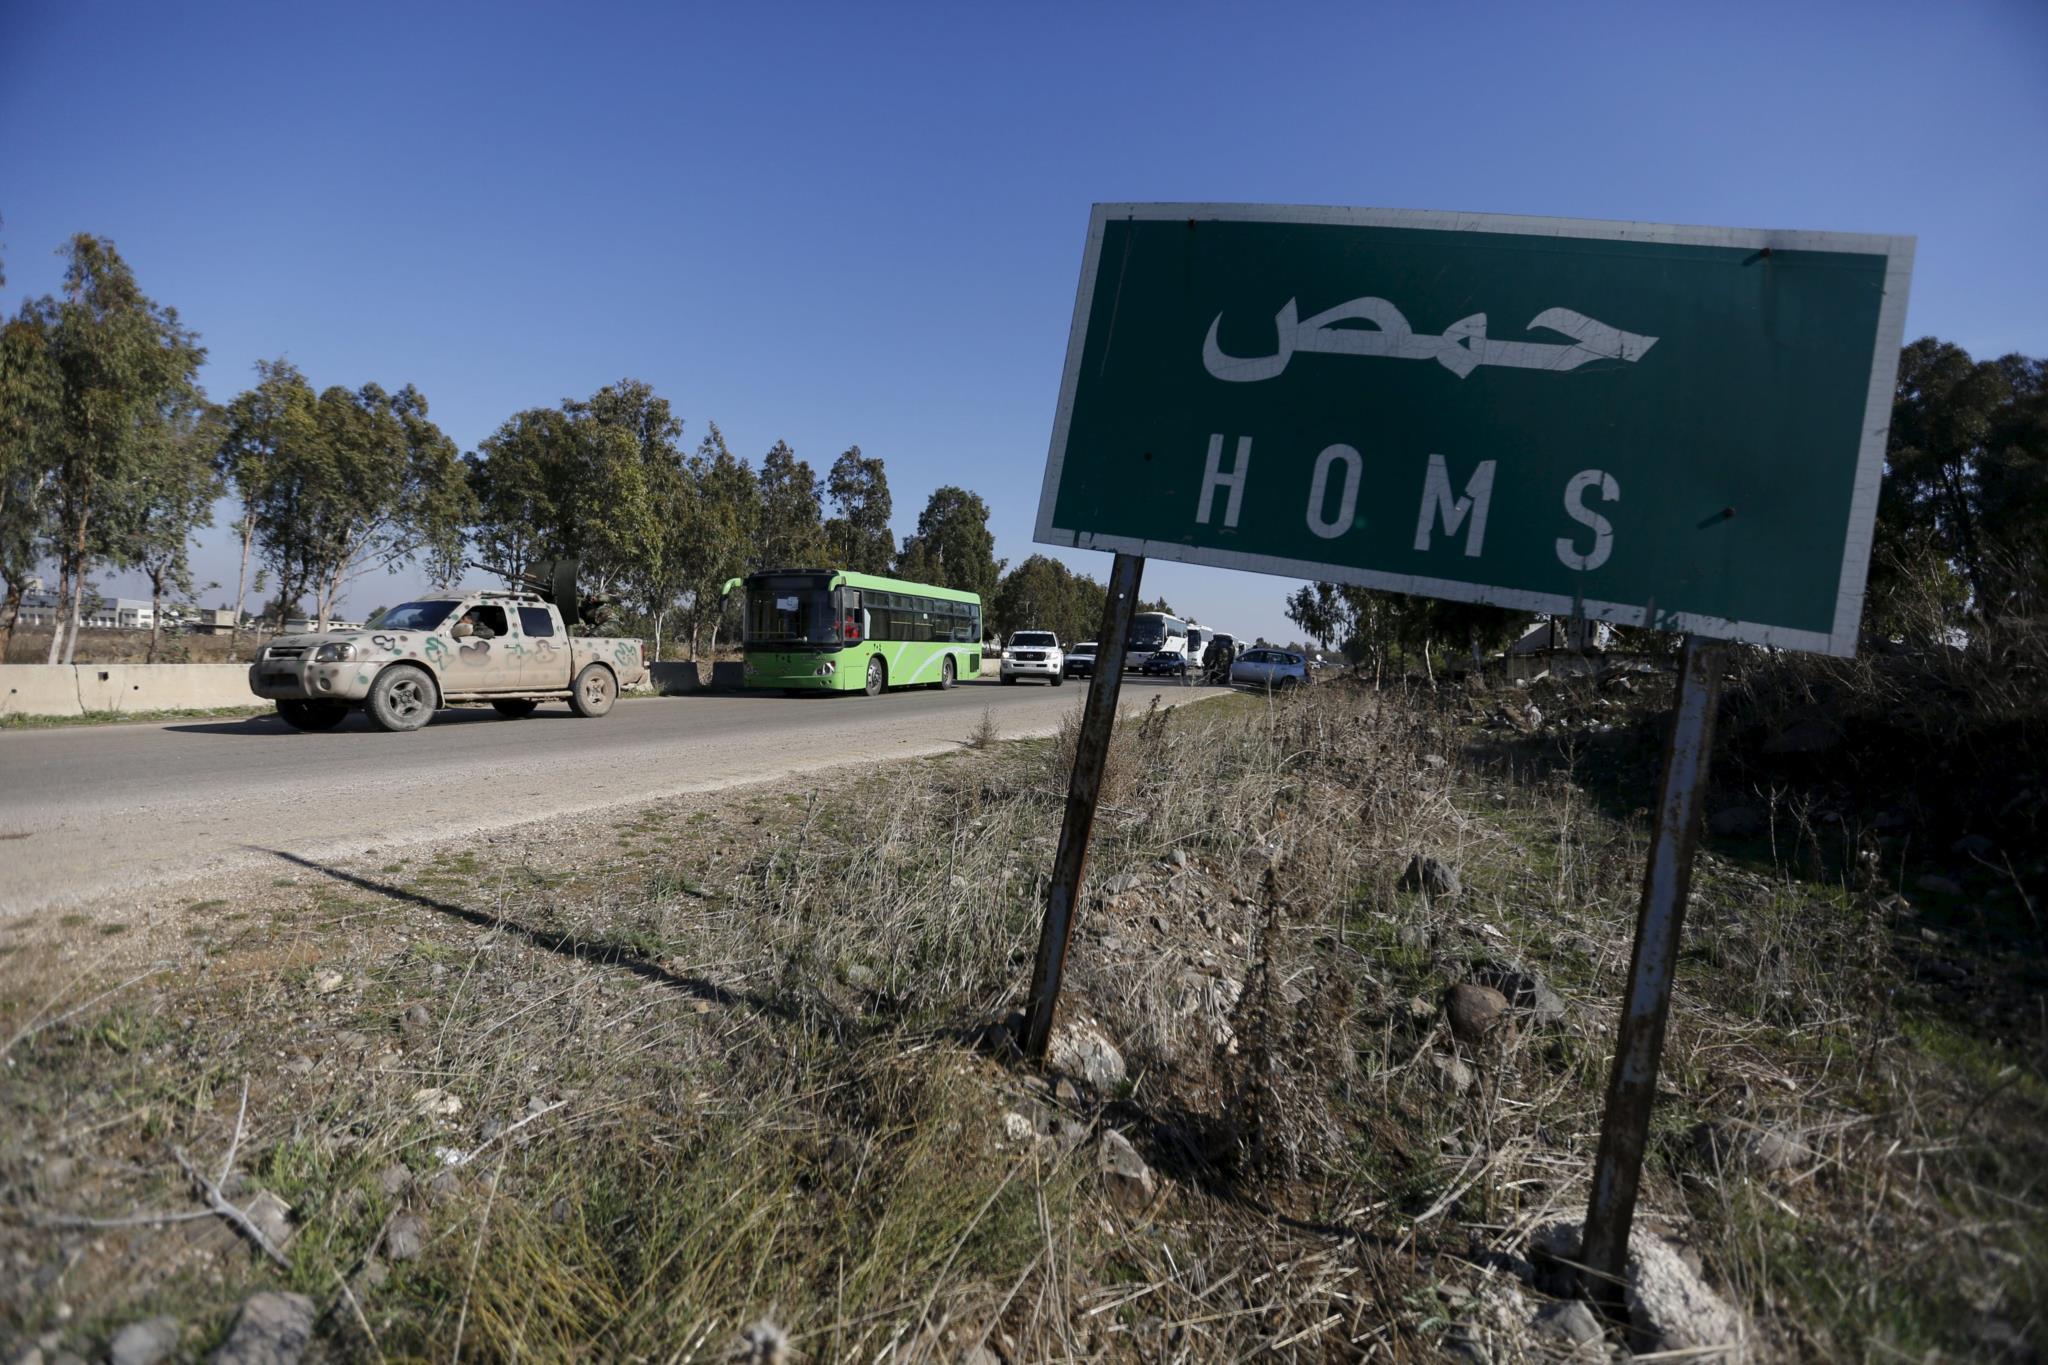 PÚBLICO - Ataque bombista na Síria faz 42 mortos